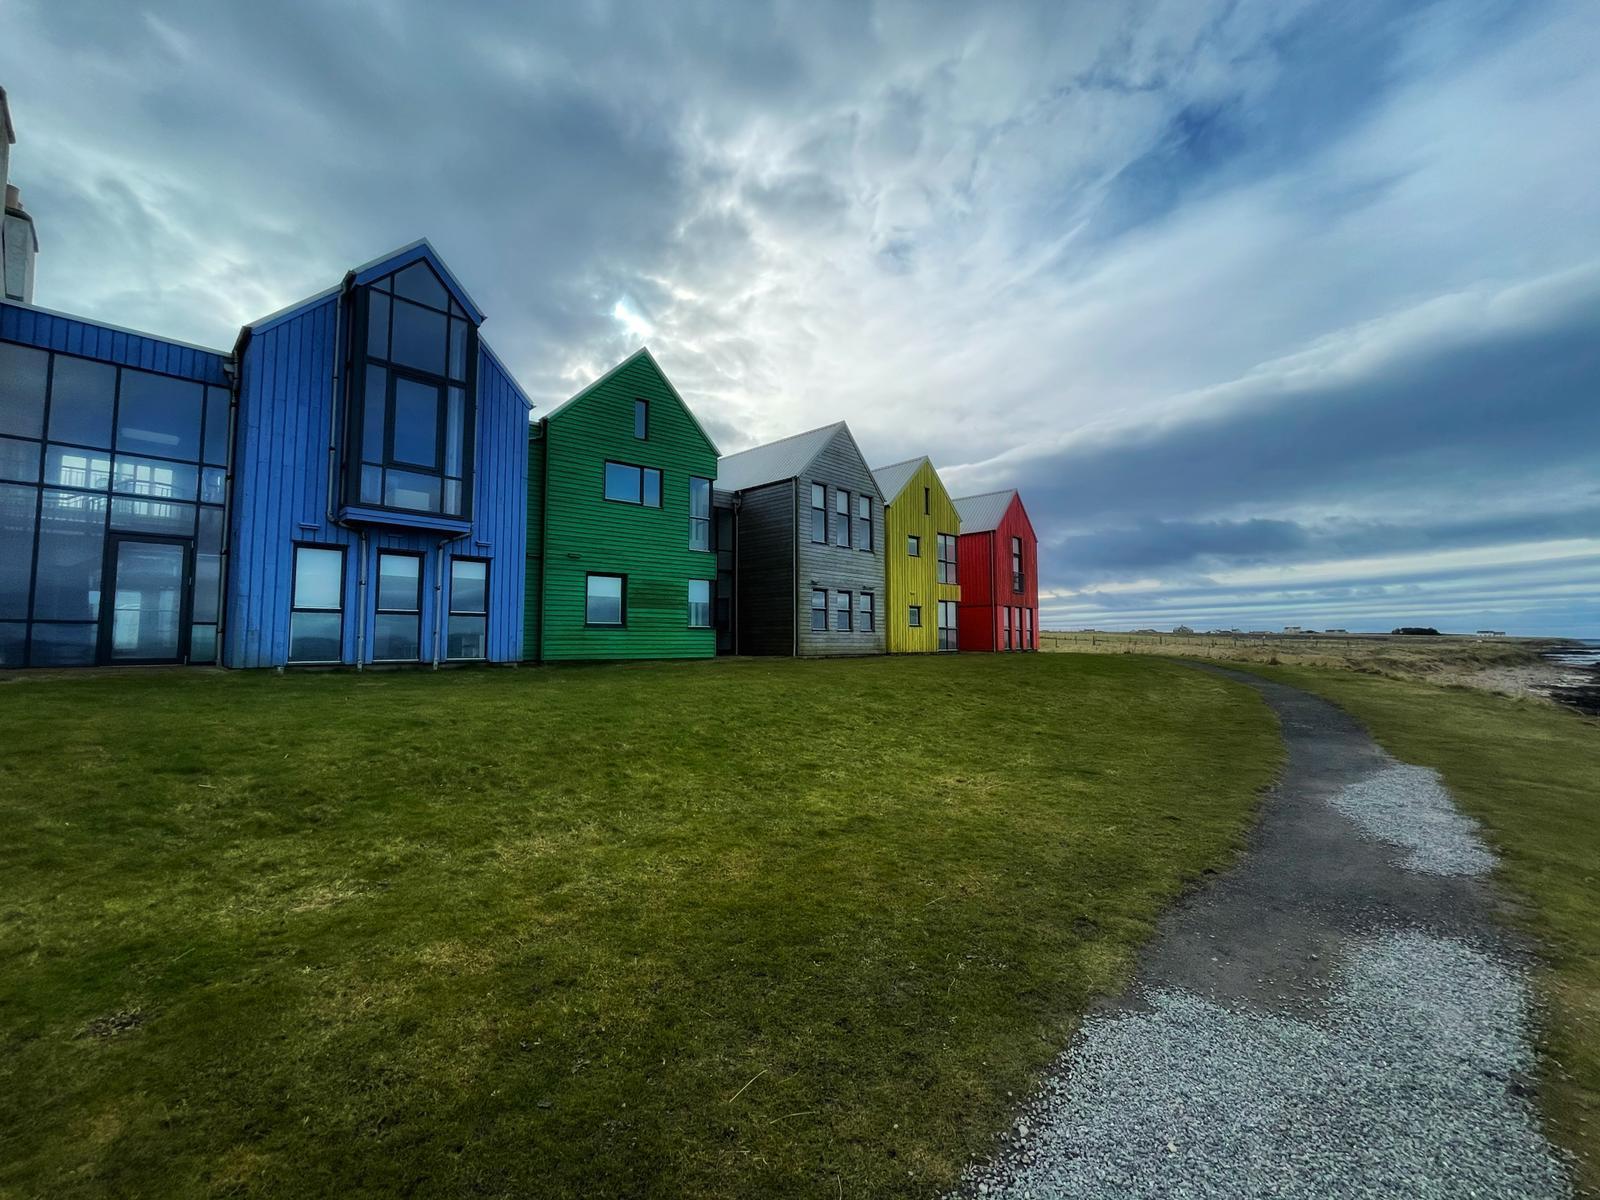 Colourful buildings at John o groats